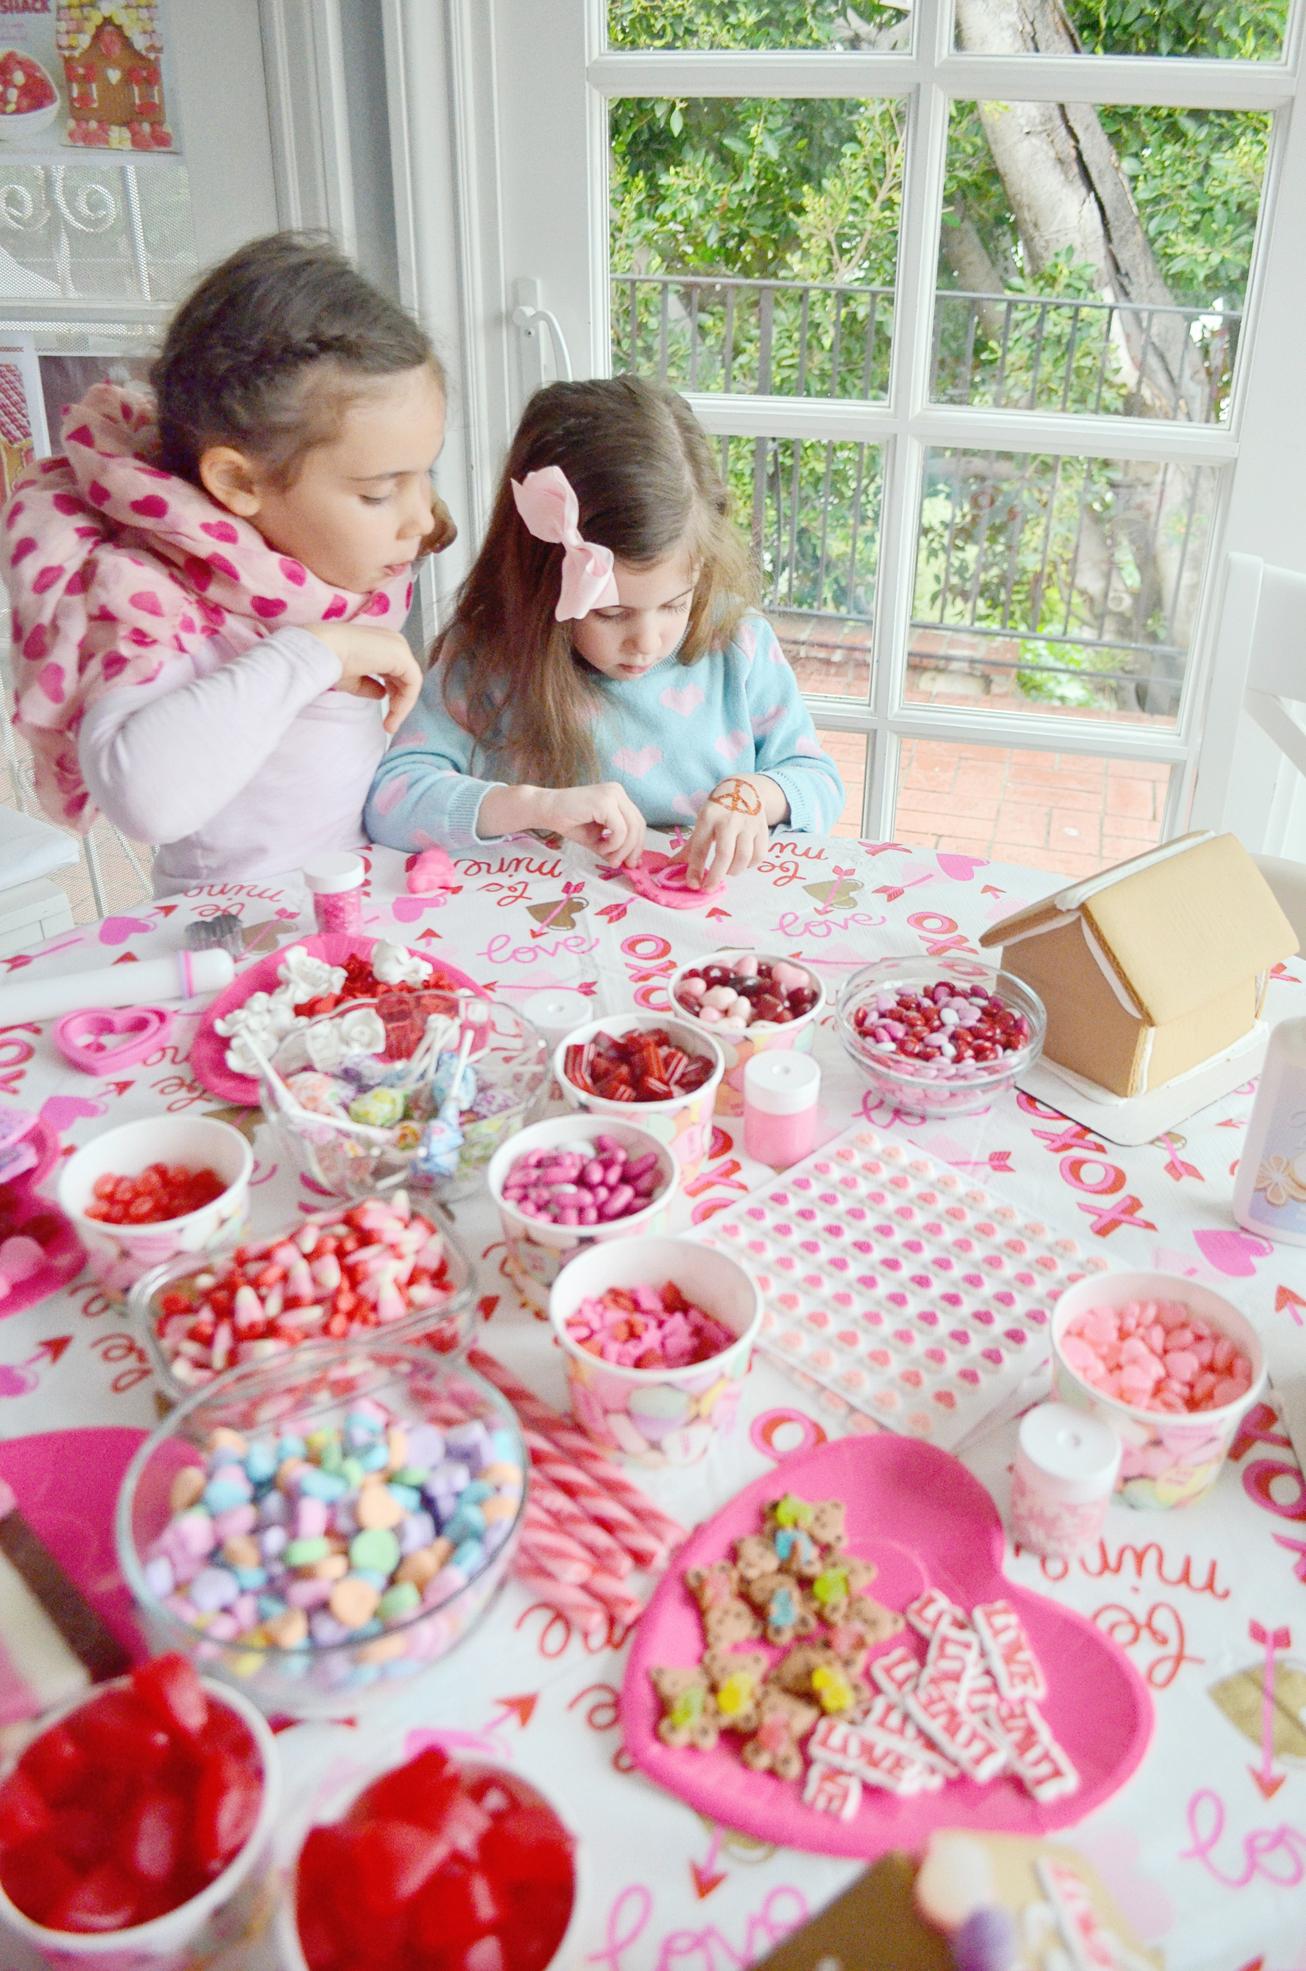 DIY Gingerbread Love Shack for Kids